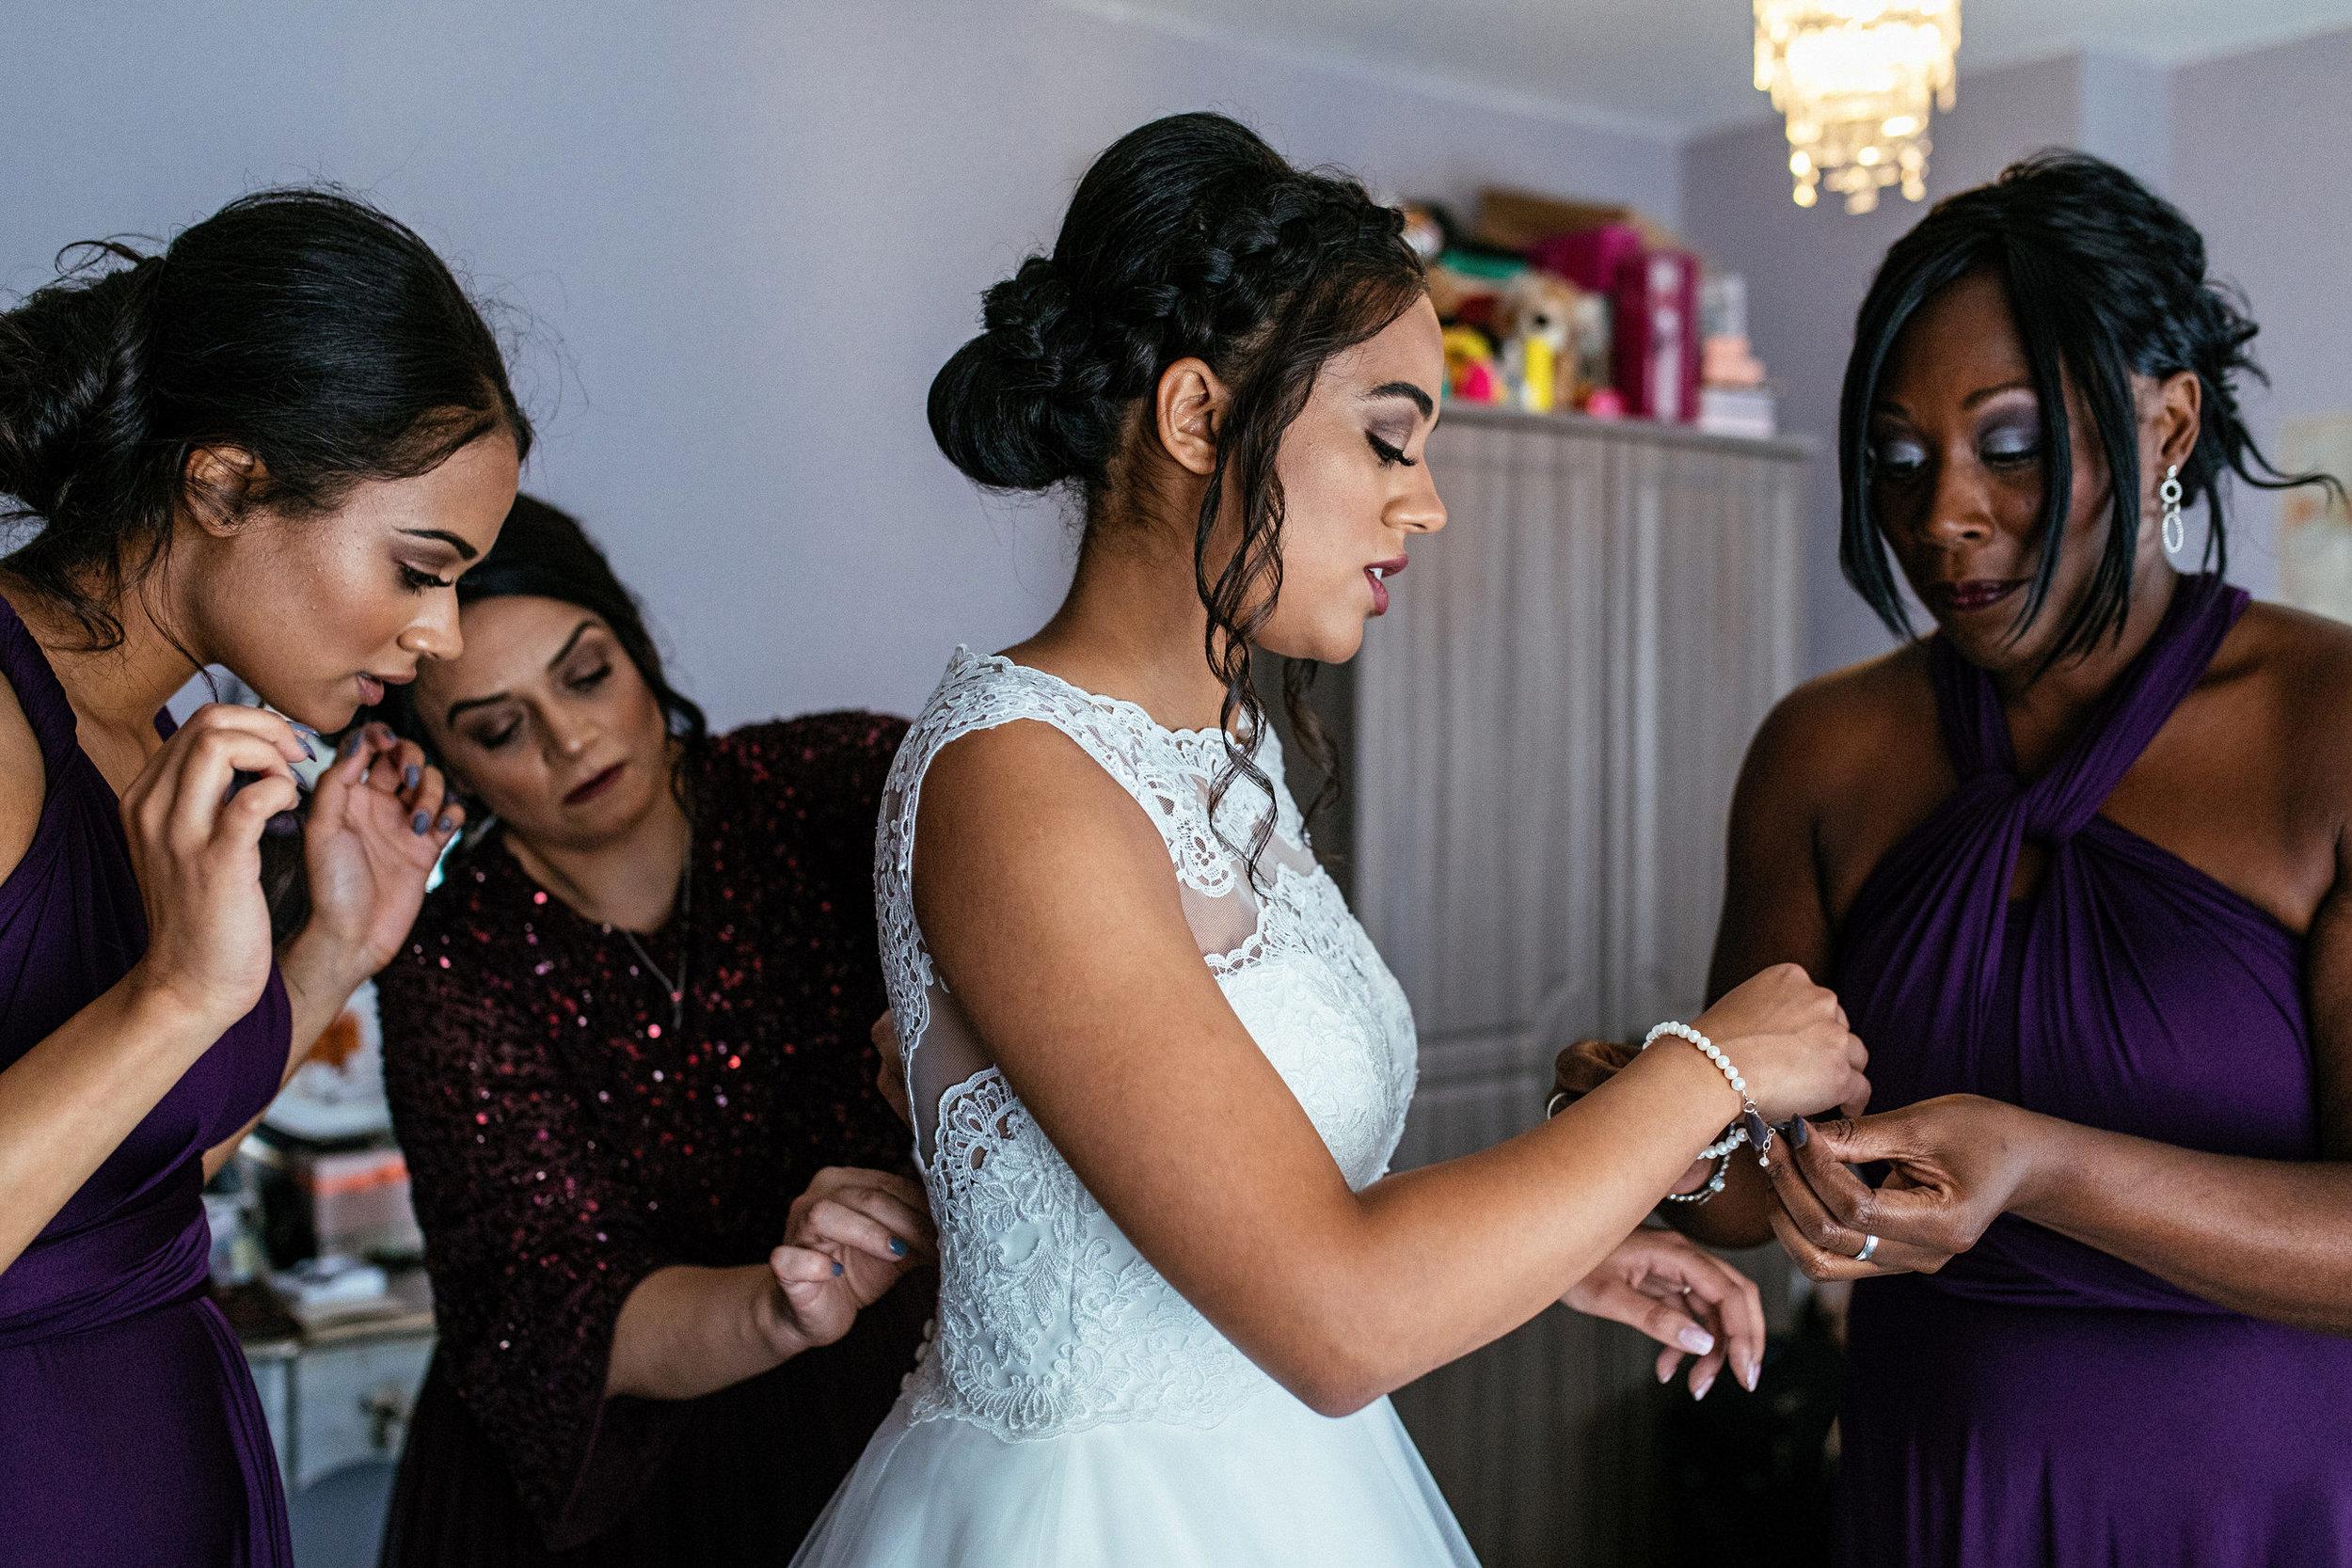 The-Bond-Company-Wedding-Photography-8-1.jpg